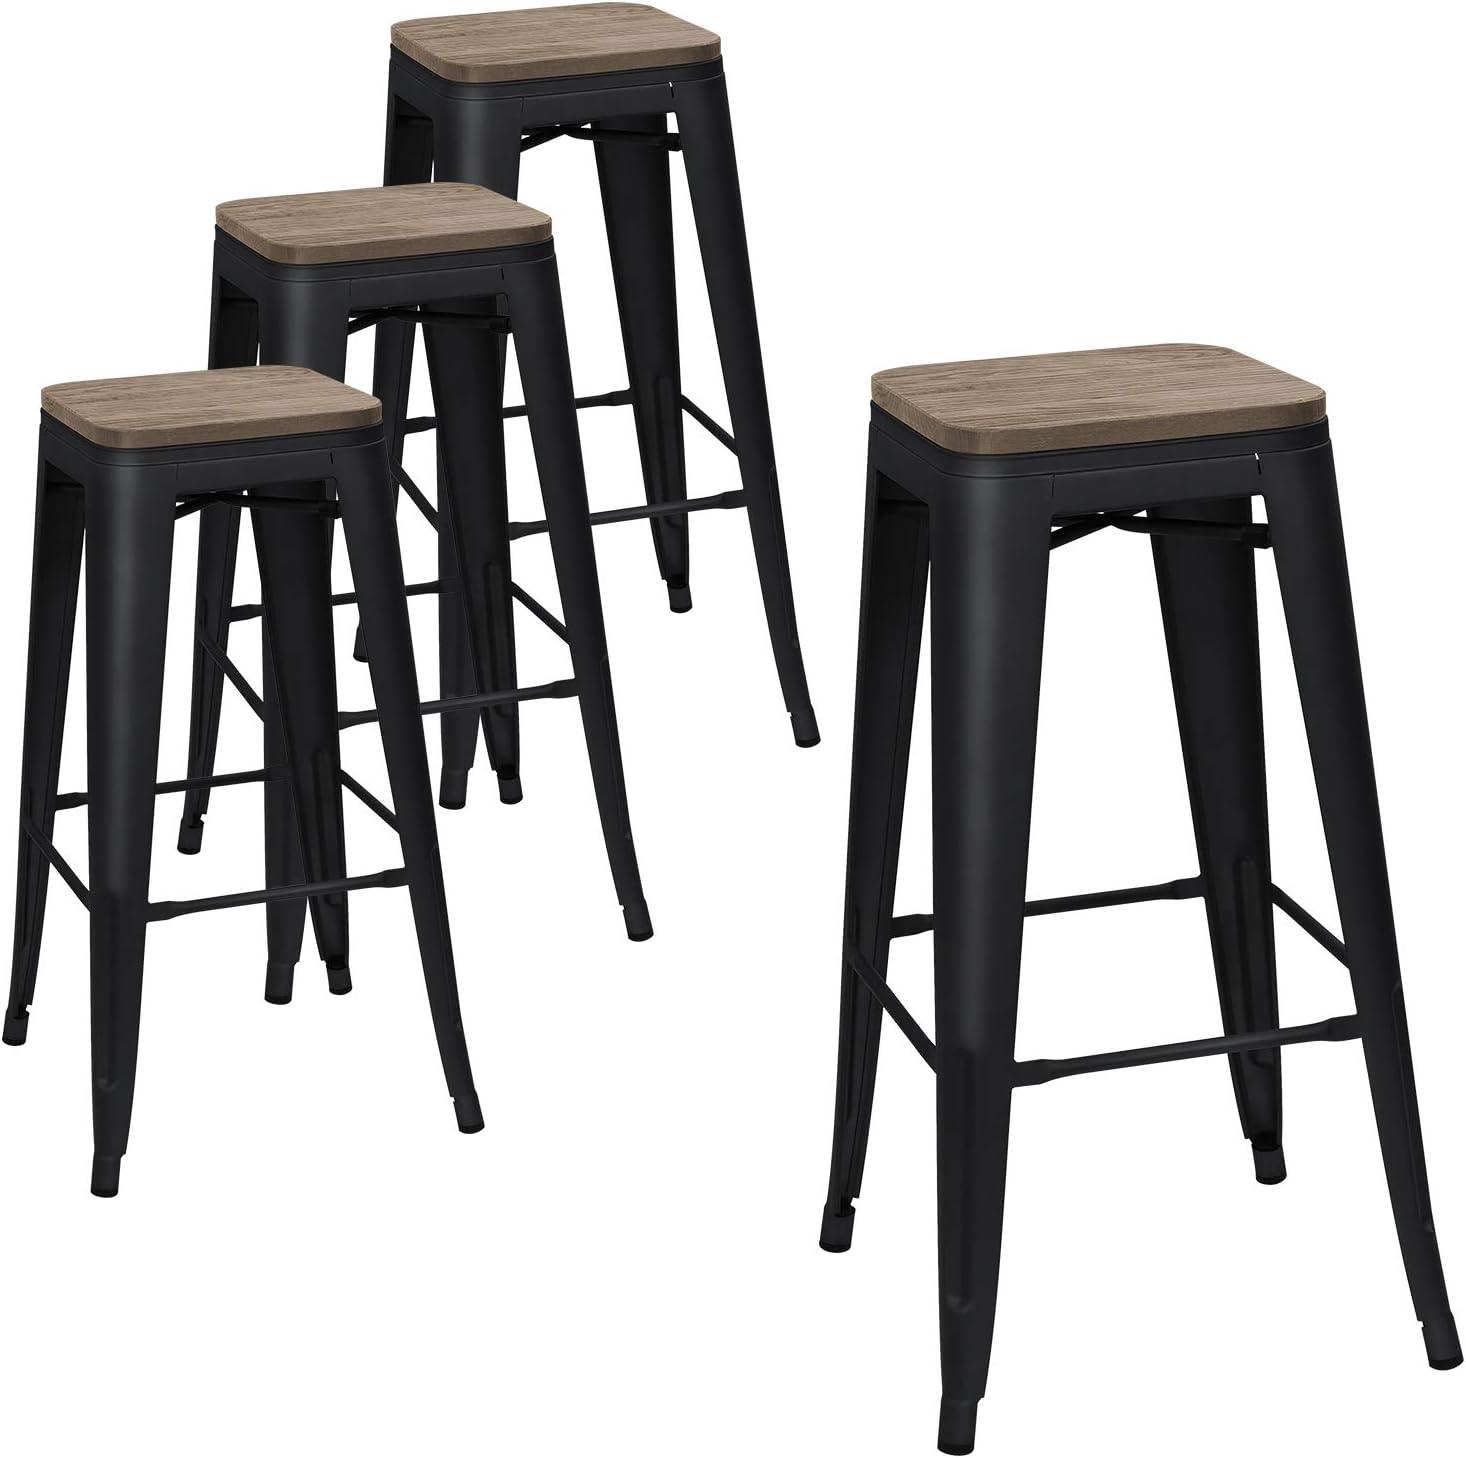 Amazon Com Devoko Metal Bar Stool 30 Indoor Outdoor Stackable Barstools Modern Industrial Square Wood Top Bar Stools Set Of 4 Black Kitchen Dining